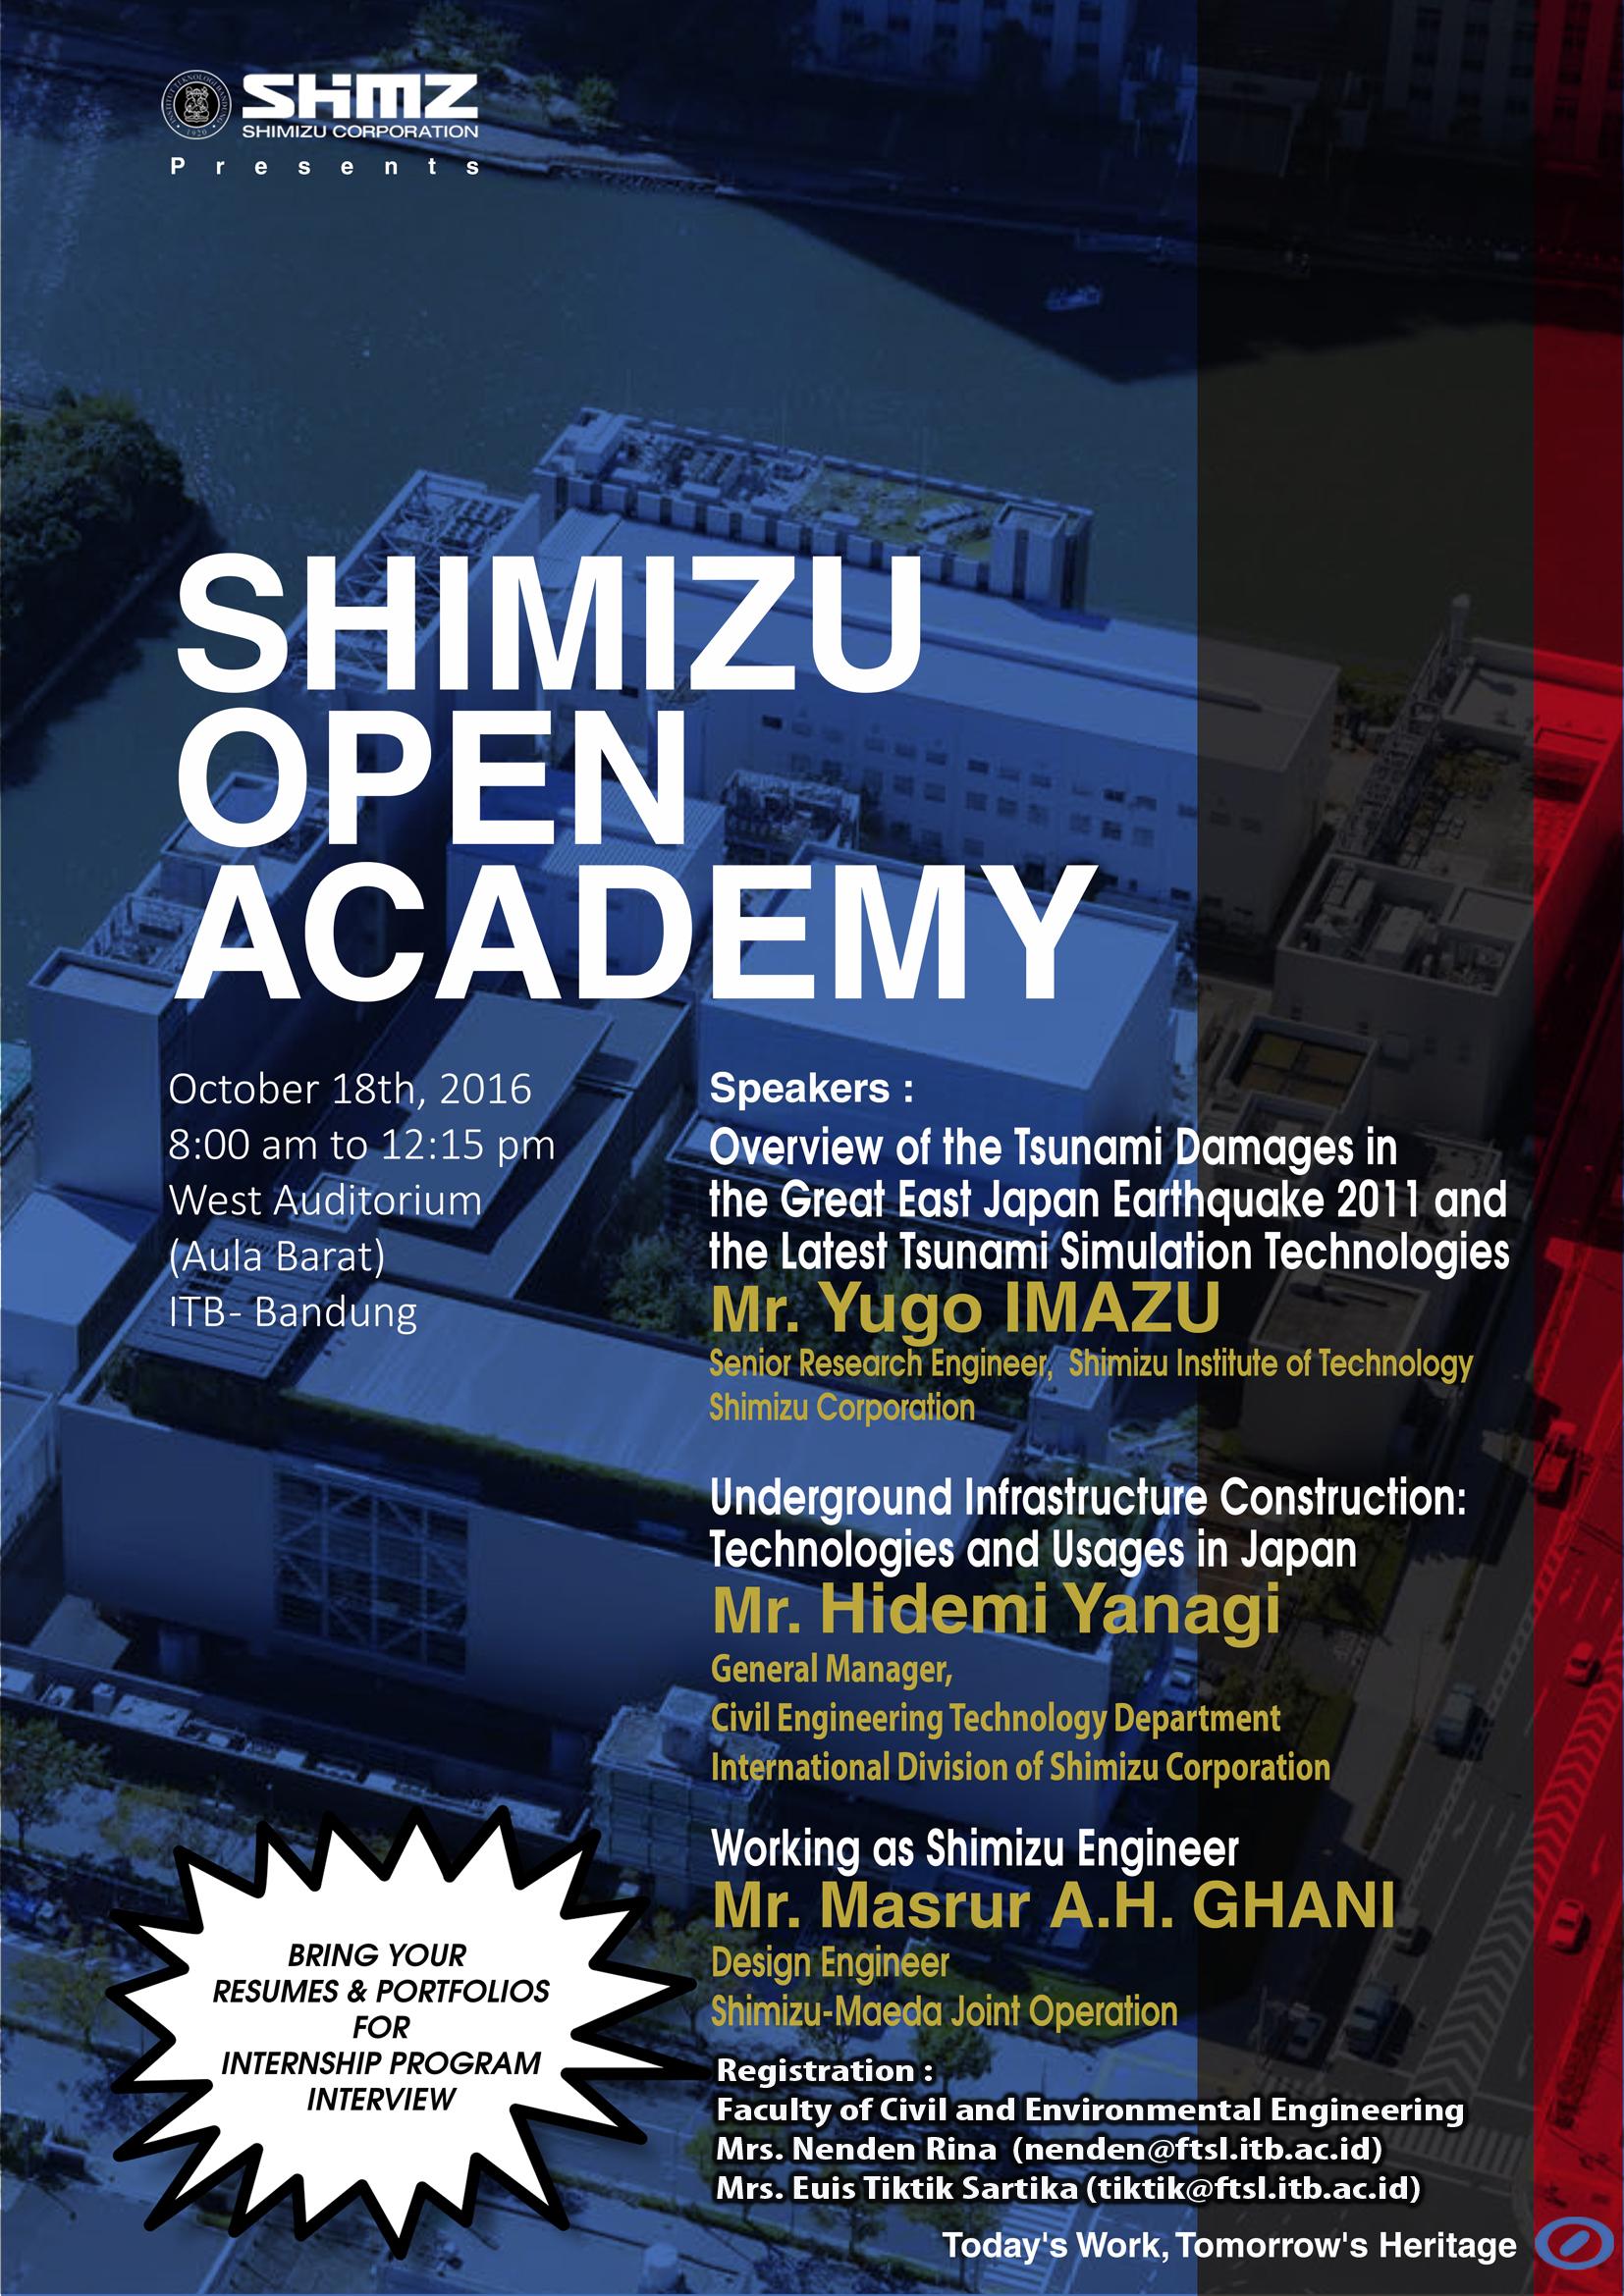 SHIMIZU OPEN ACADEMY